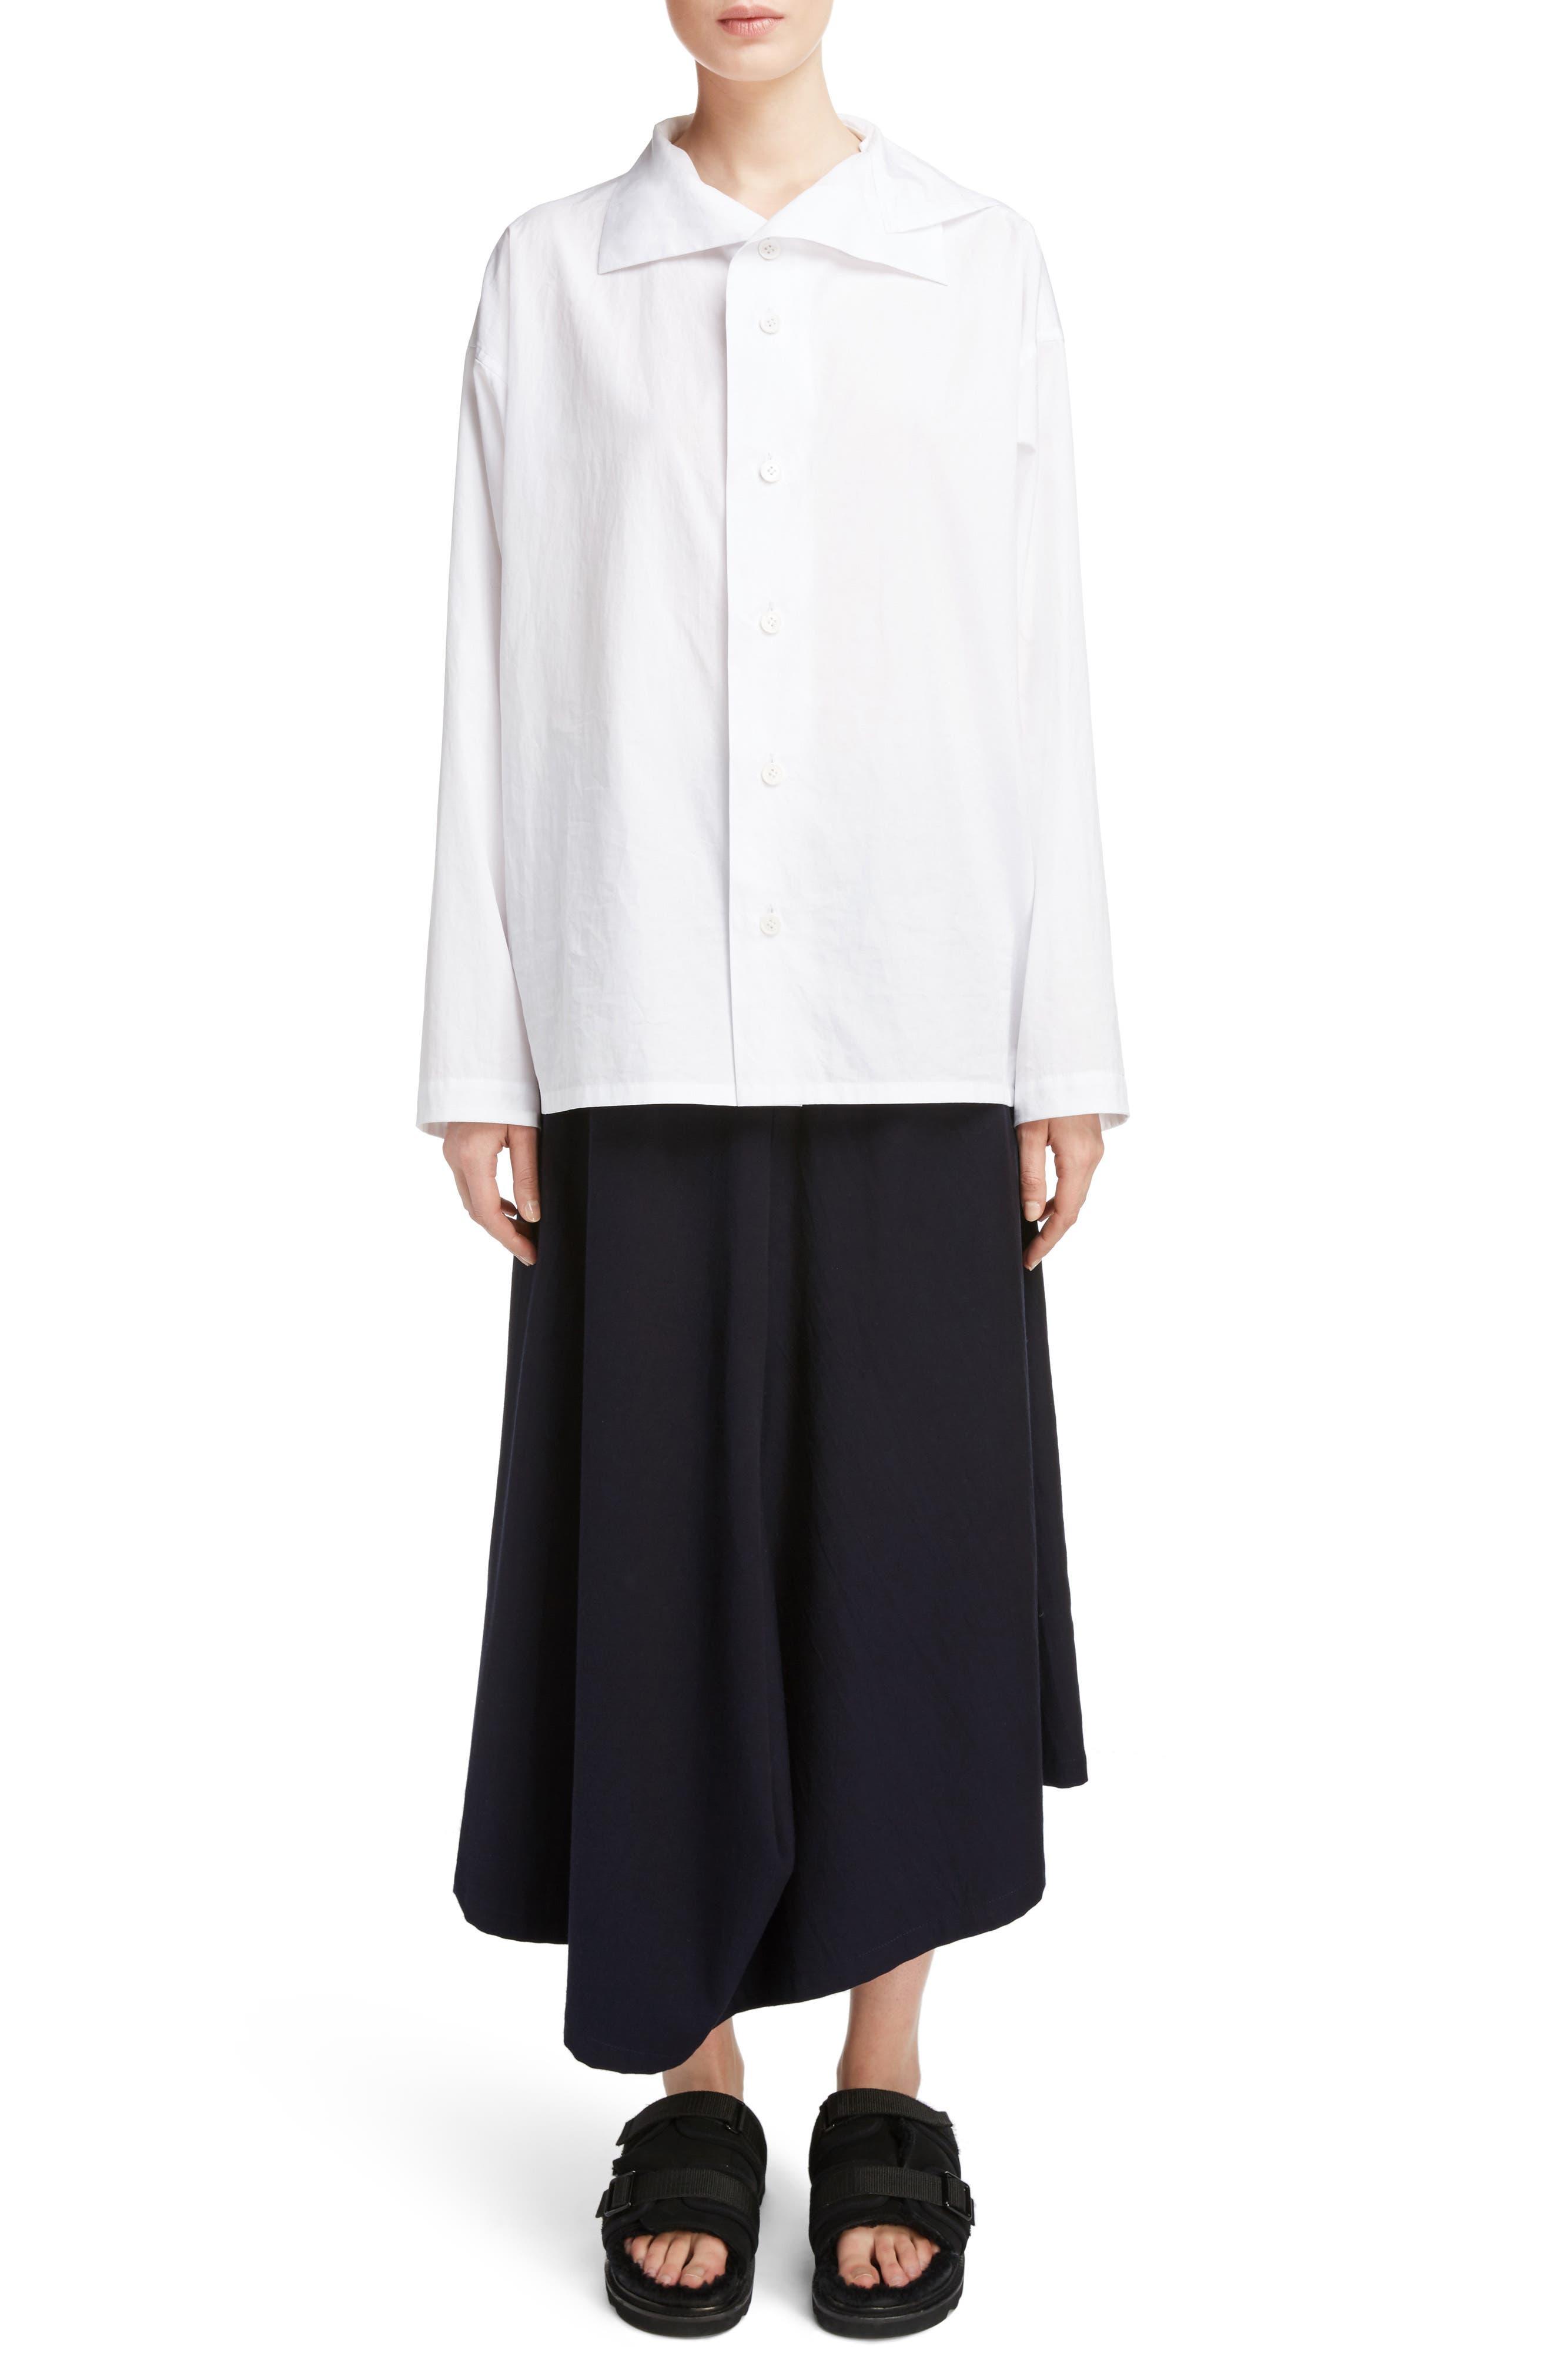 Main Image - Y's by Yohji Yamamoto Asymmetrical Collar Blouse